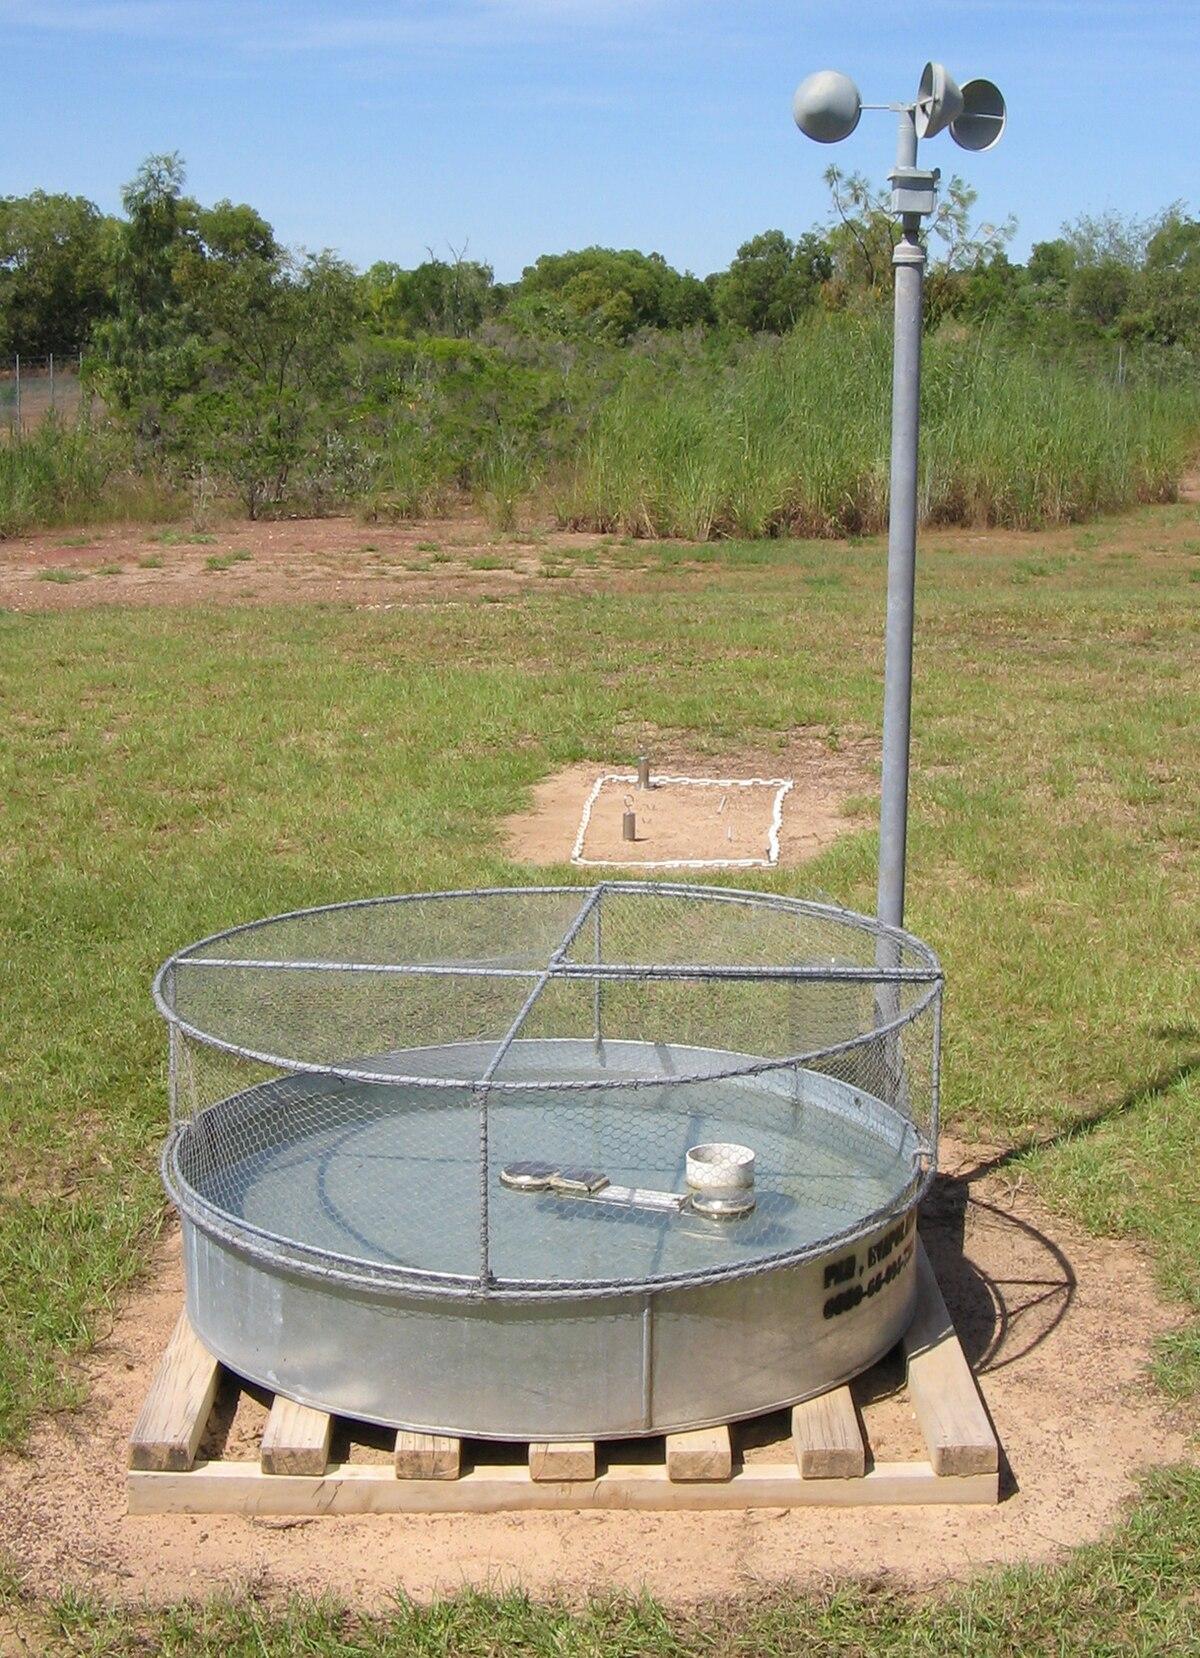 Pan evaporation - Wikipedia